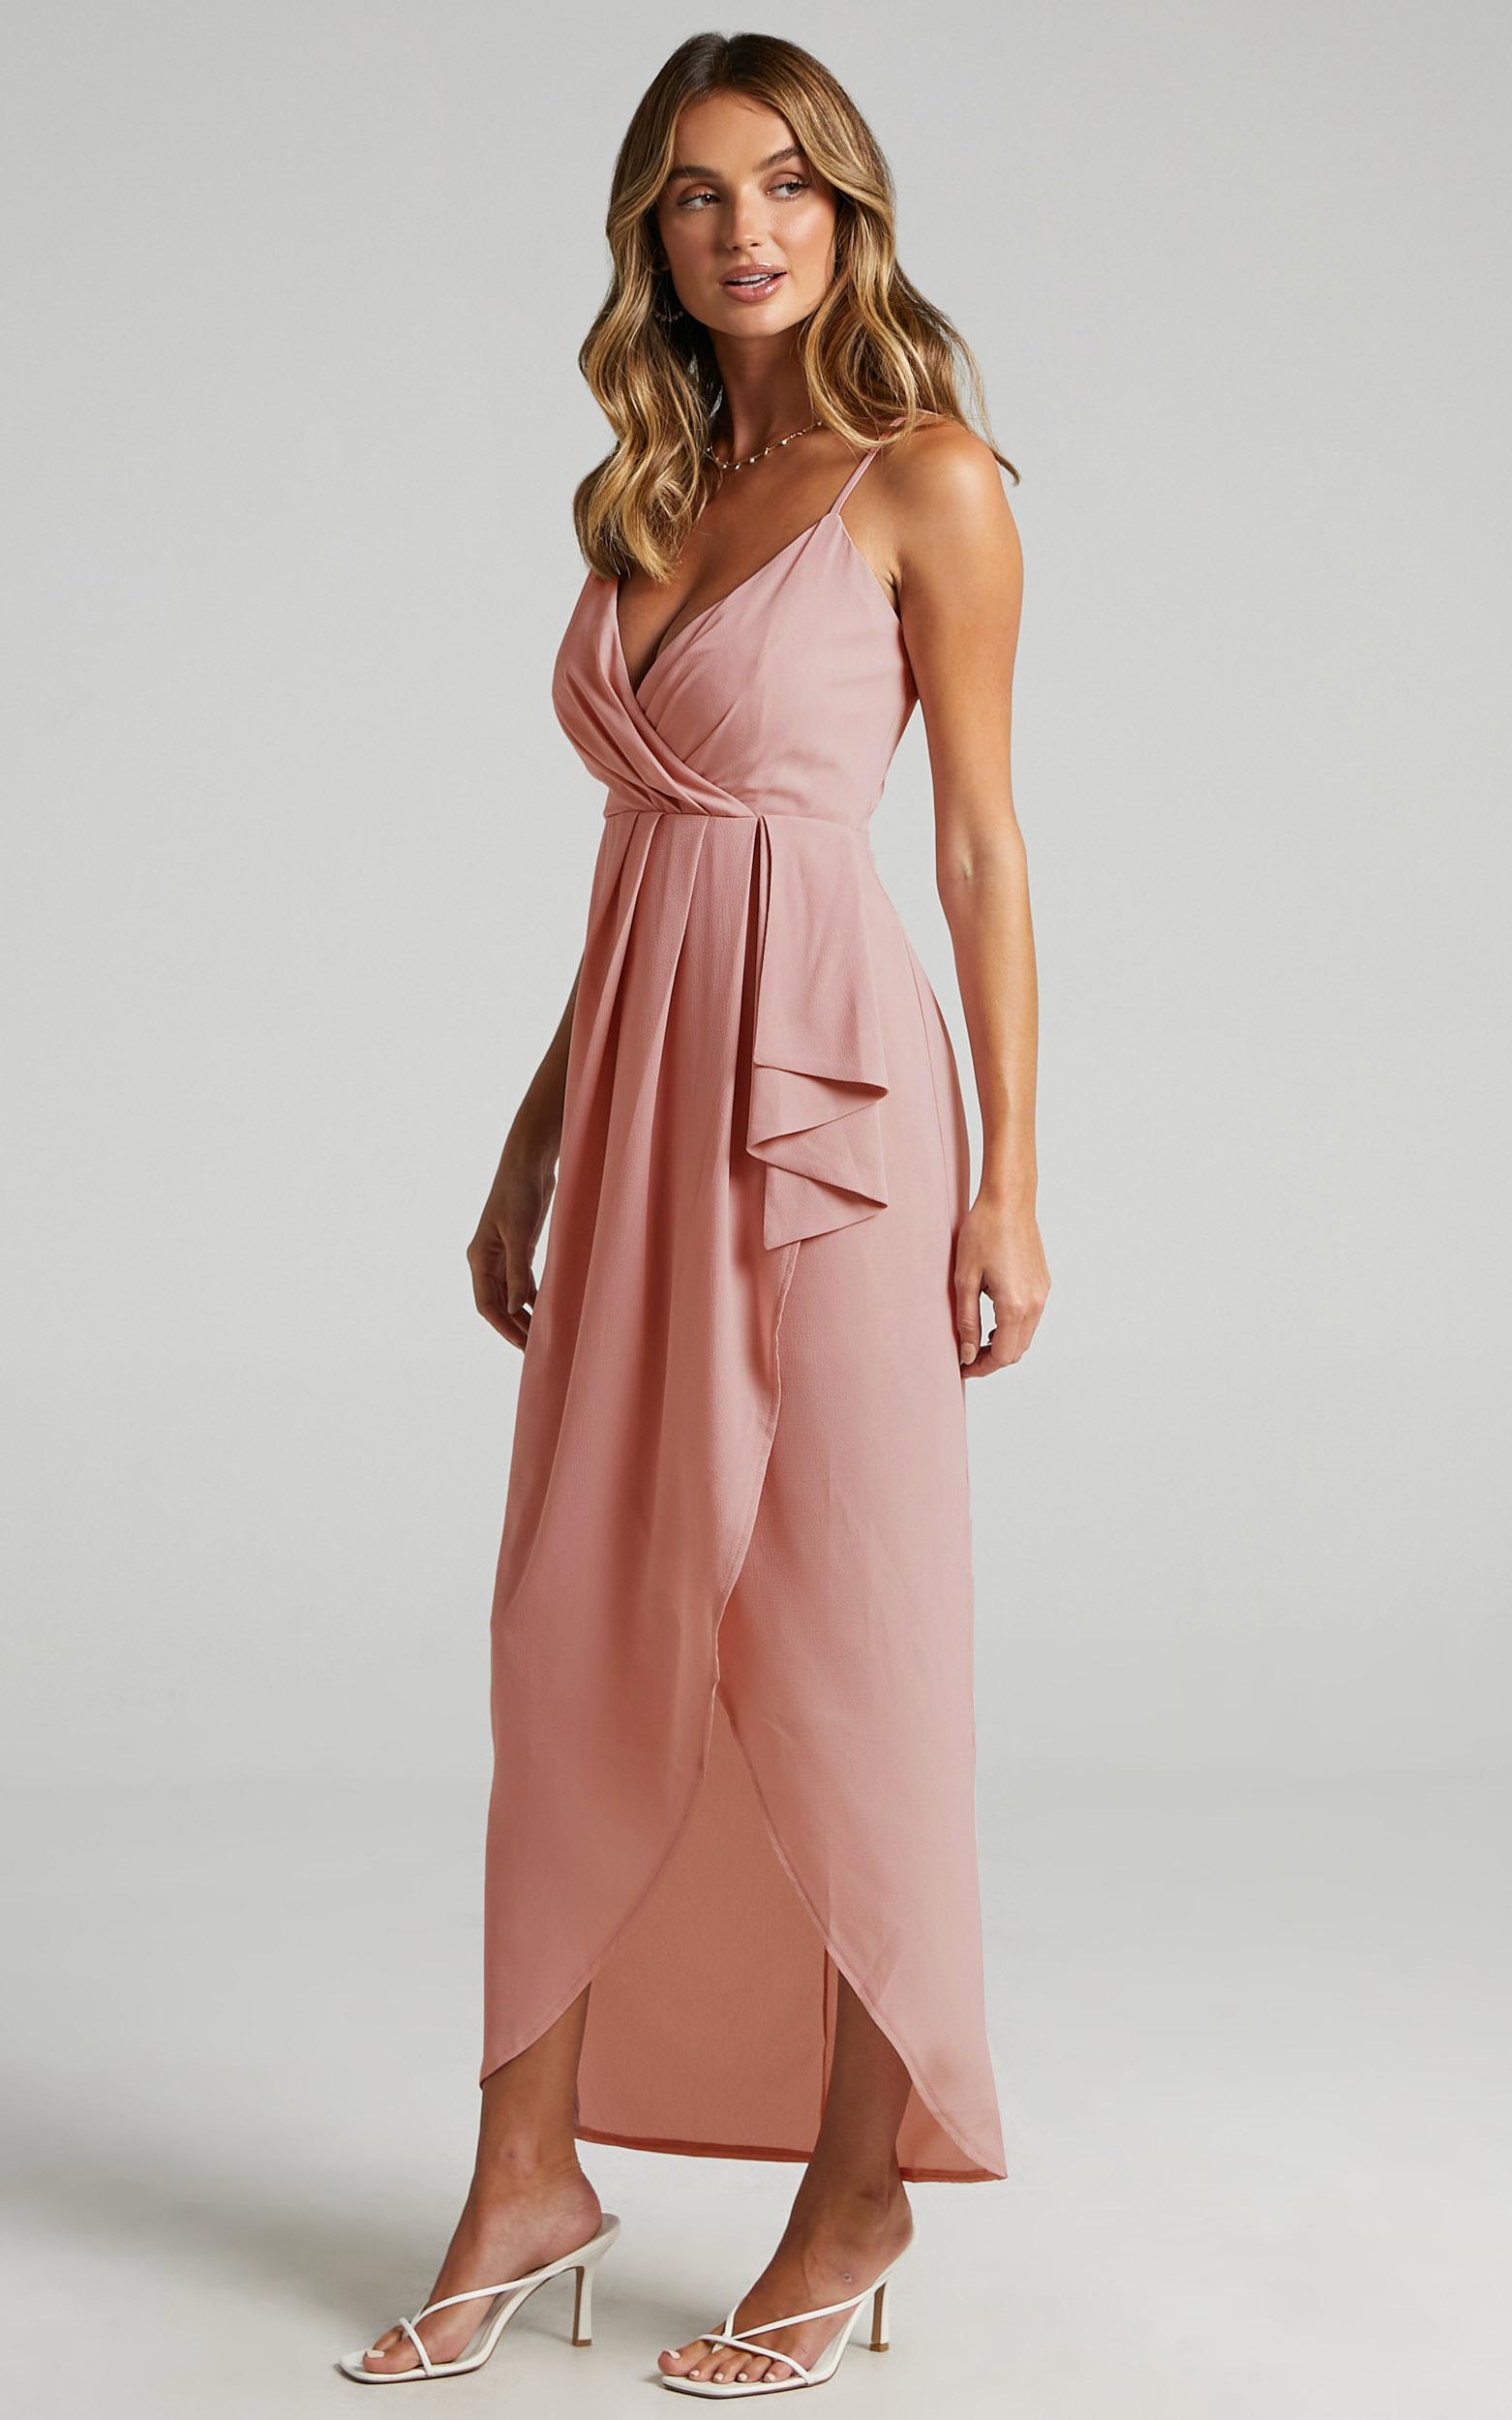 Gave Me You Dress in Blush - 08, PNK2, hi-res image number null